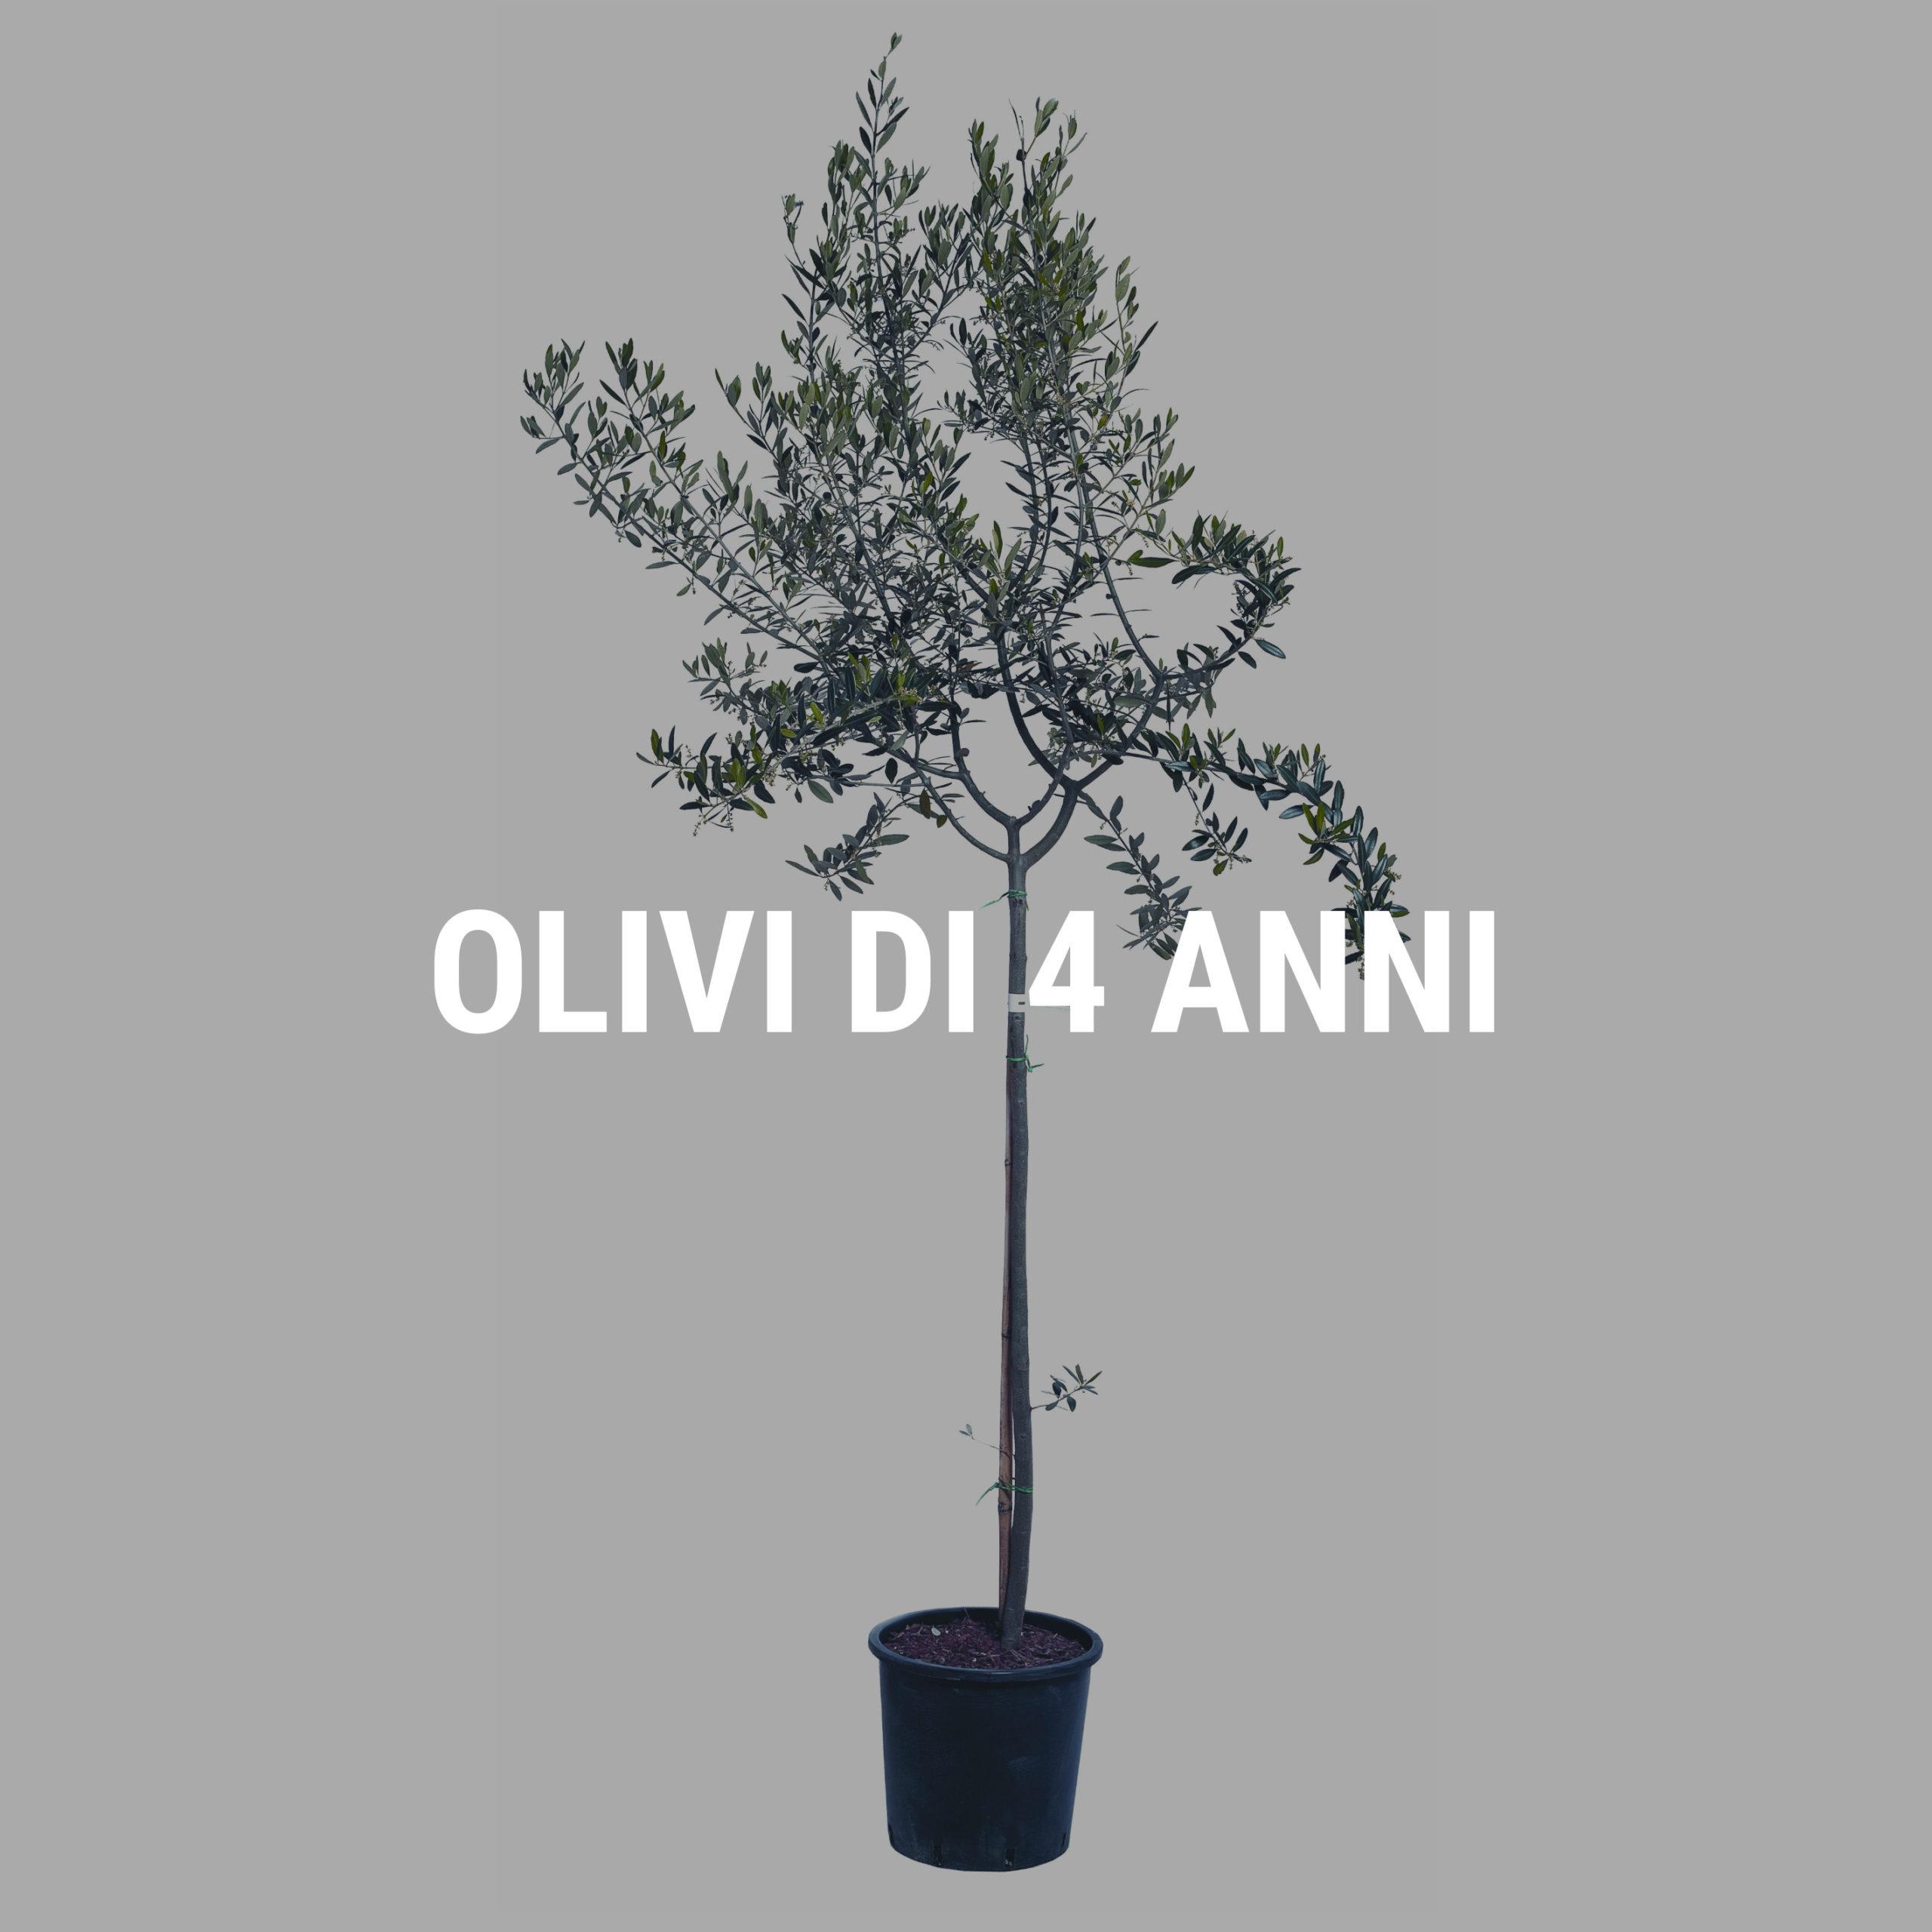 http://www.spoolivi.com/wp-content/uploads/2021/03/olivi_4_anni-2-scaled.jpg